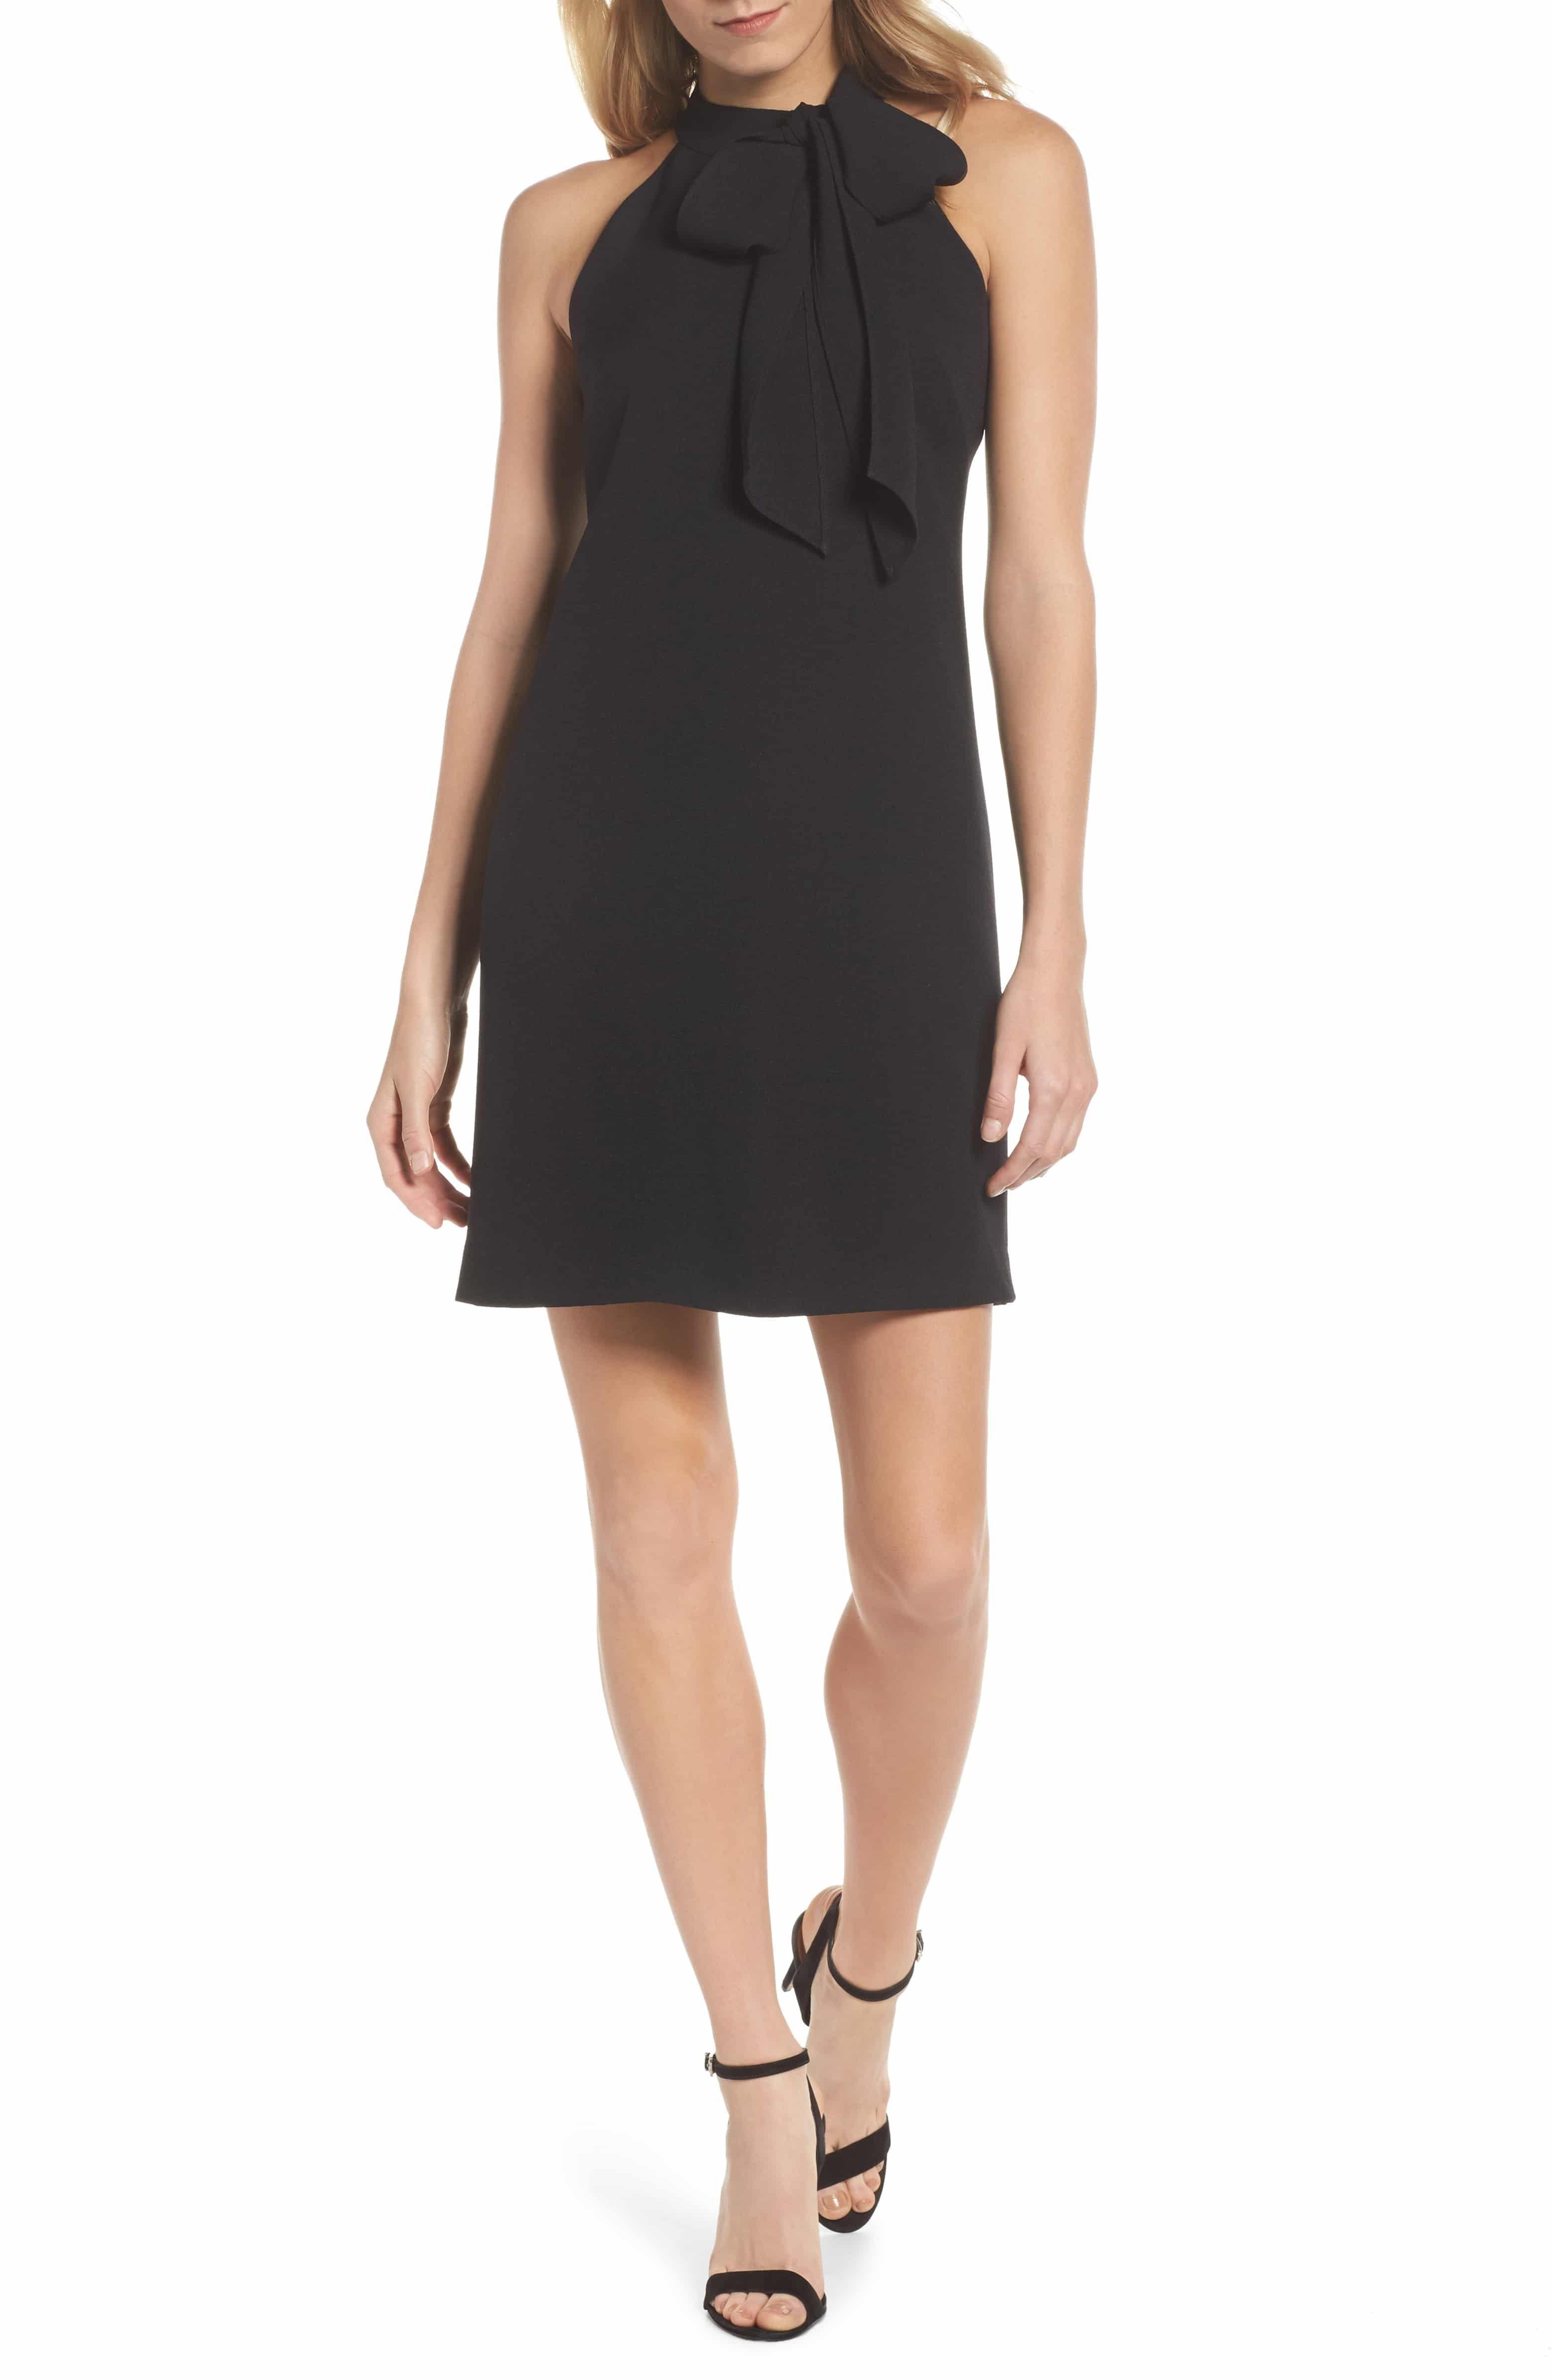 Vince Camuto Halter Tie Neck A Line Dress Nordstrom A Line Dress Trendy Cocktail Dresses Halter Cocktail Dress [ 4784 x 3120 Pixel ]